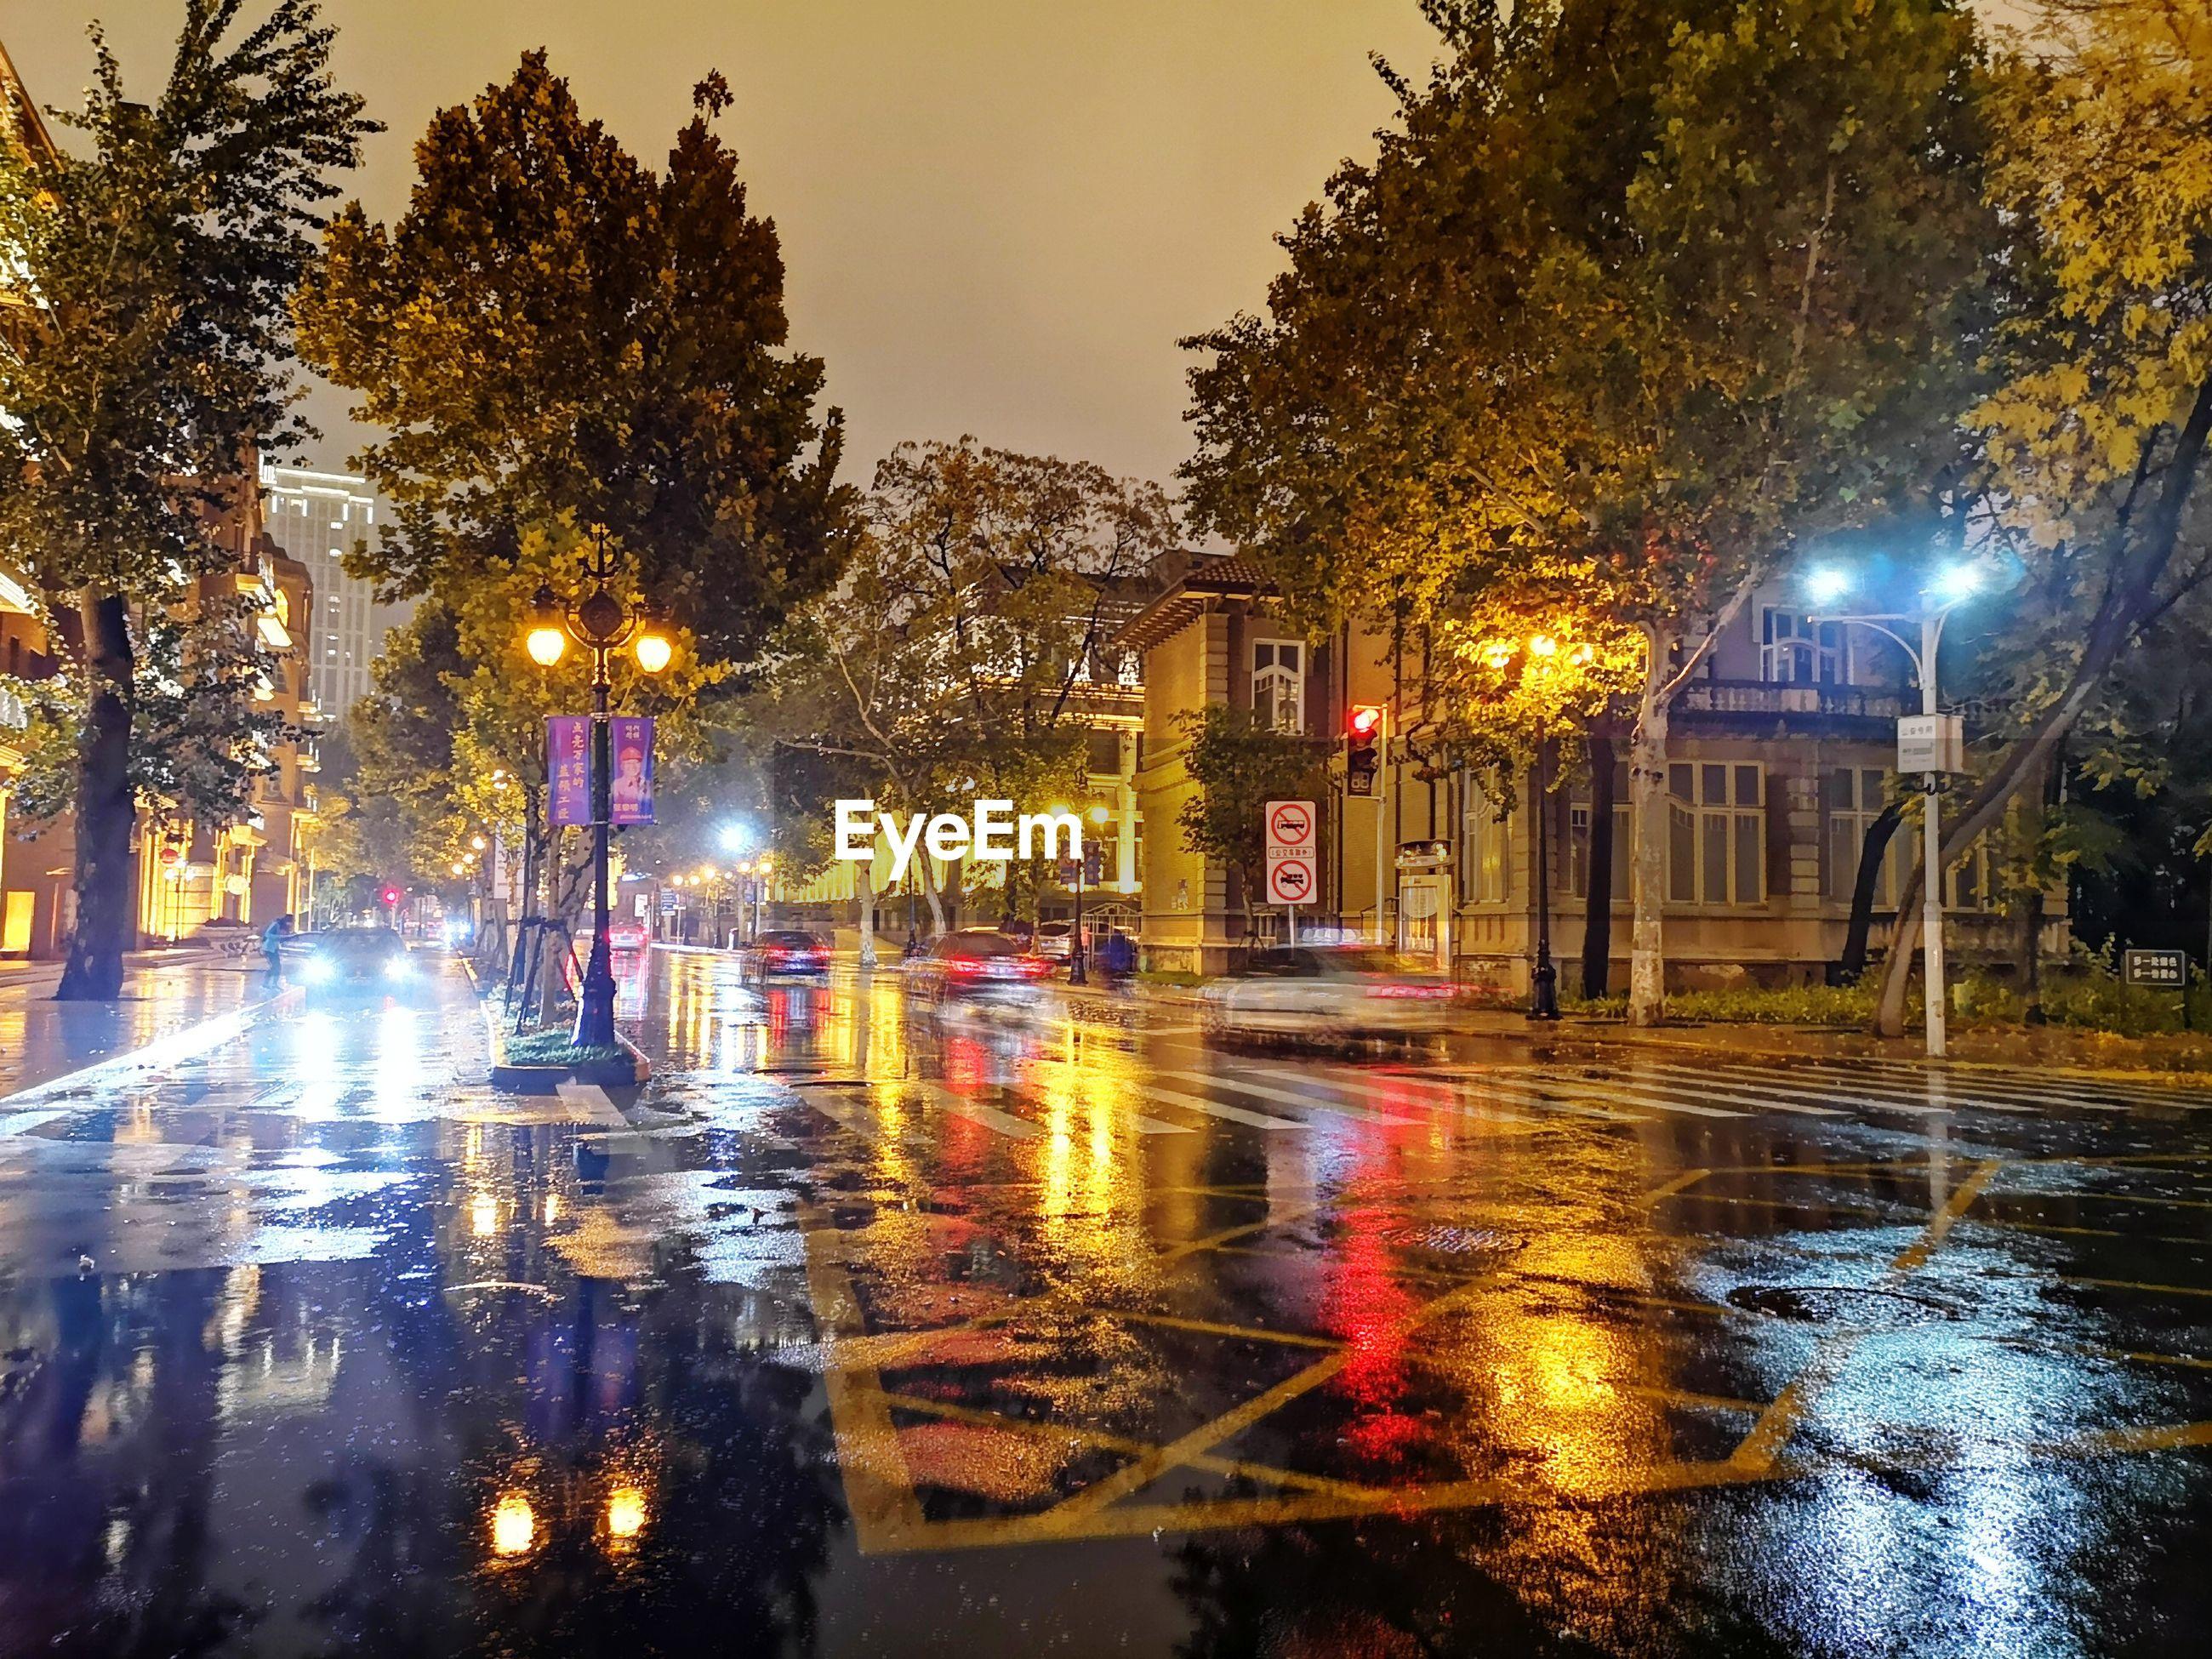 ILLUMINATED CITY STREET DURING RAINY SEASON